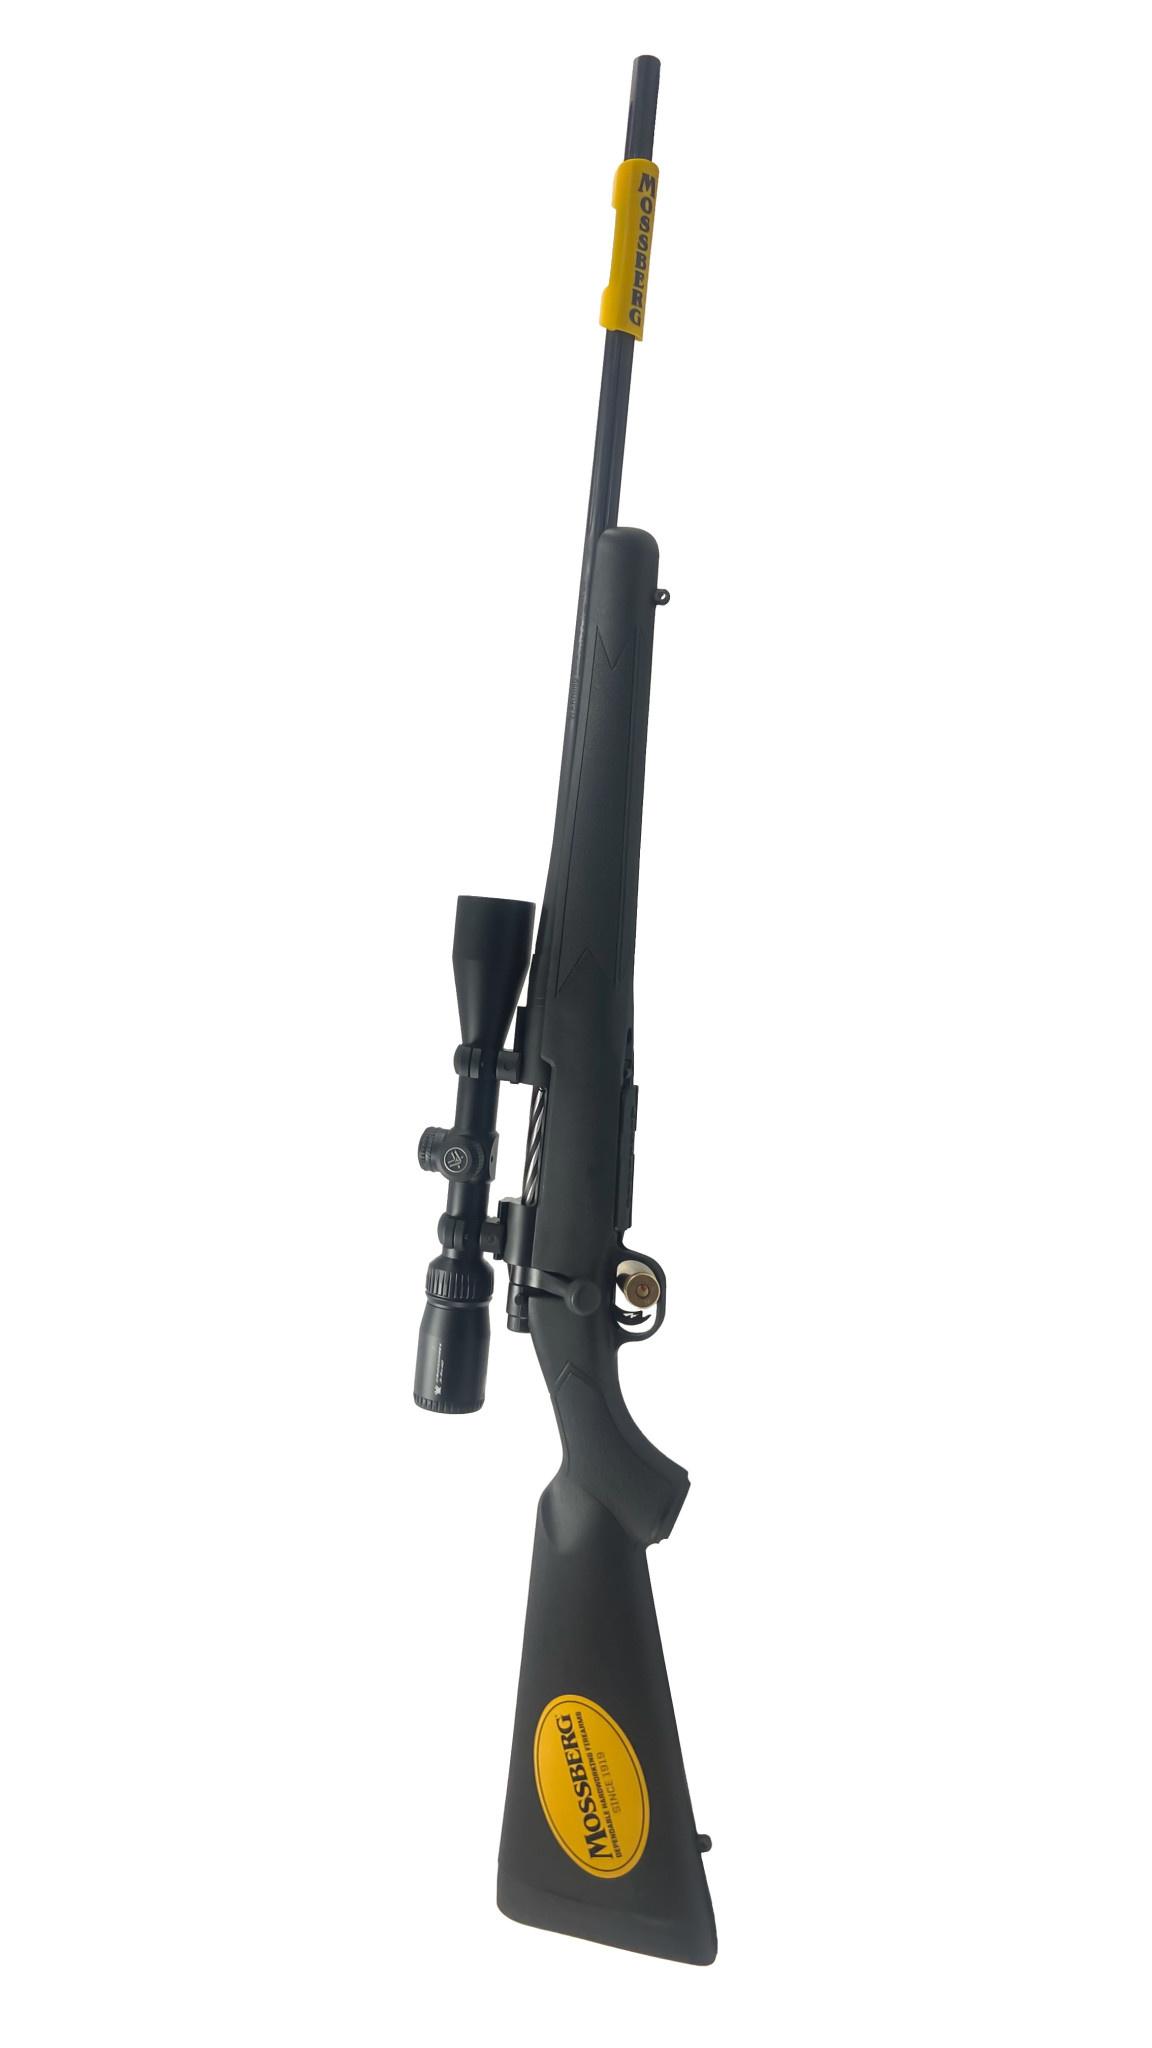 Mossberg Patriot 22-250 Rem w/Vortex Crossfire II